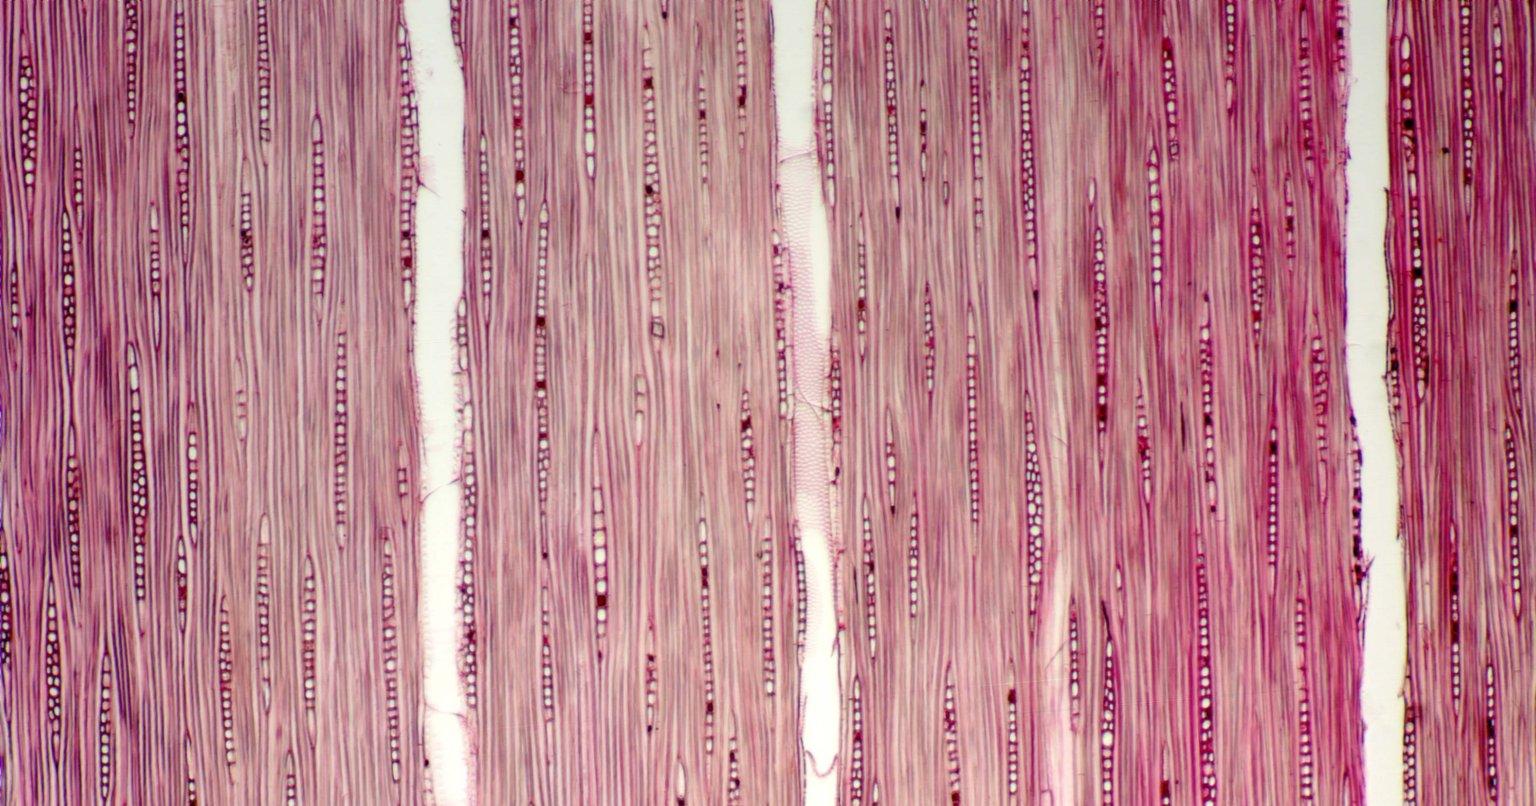 PHYLLANTHACEAE Phyllanthus valleanus